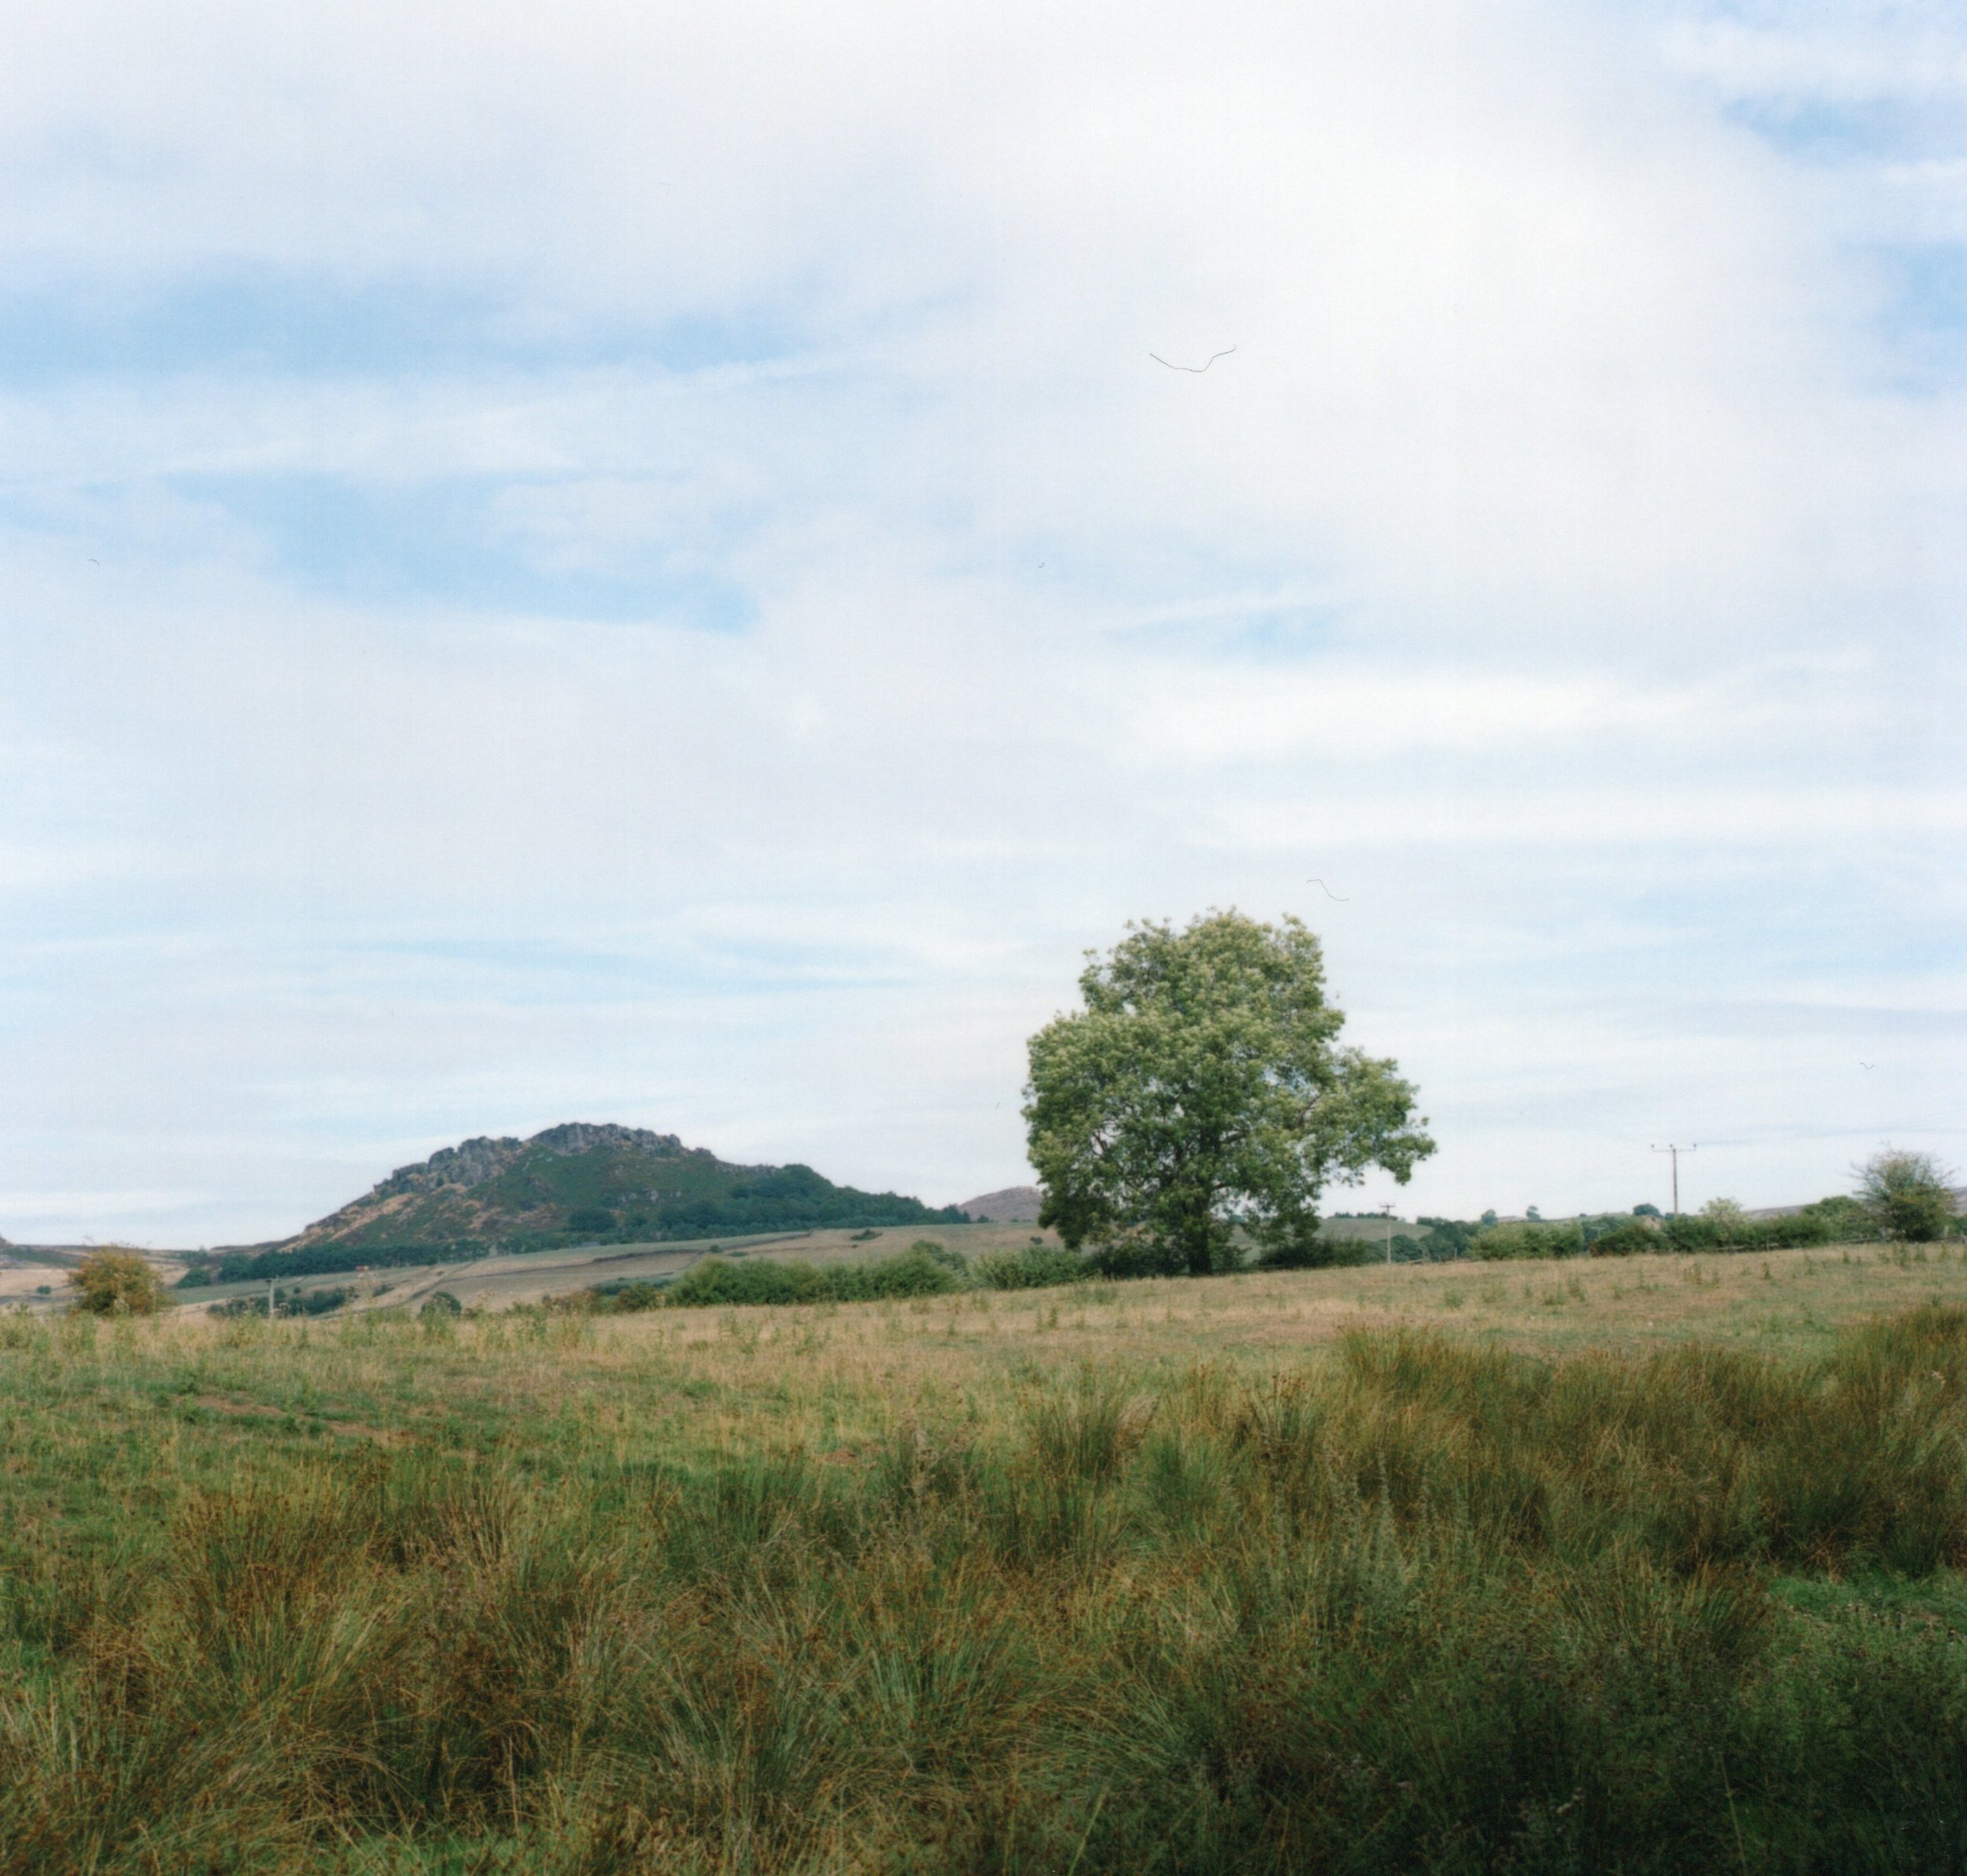 landscape 2 f8 500th sec.jpg